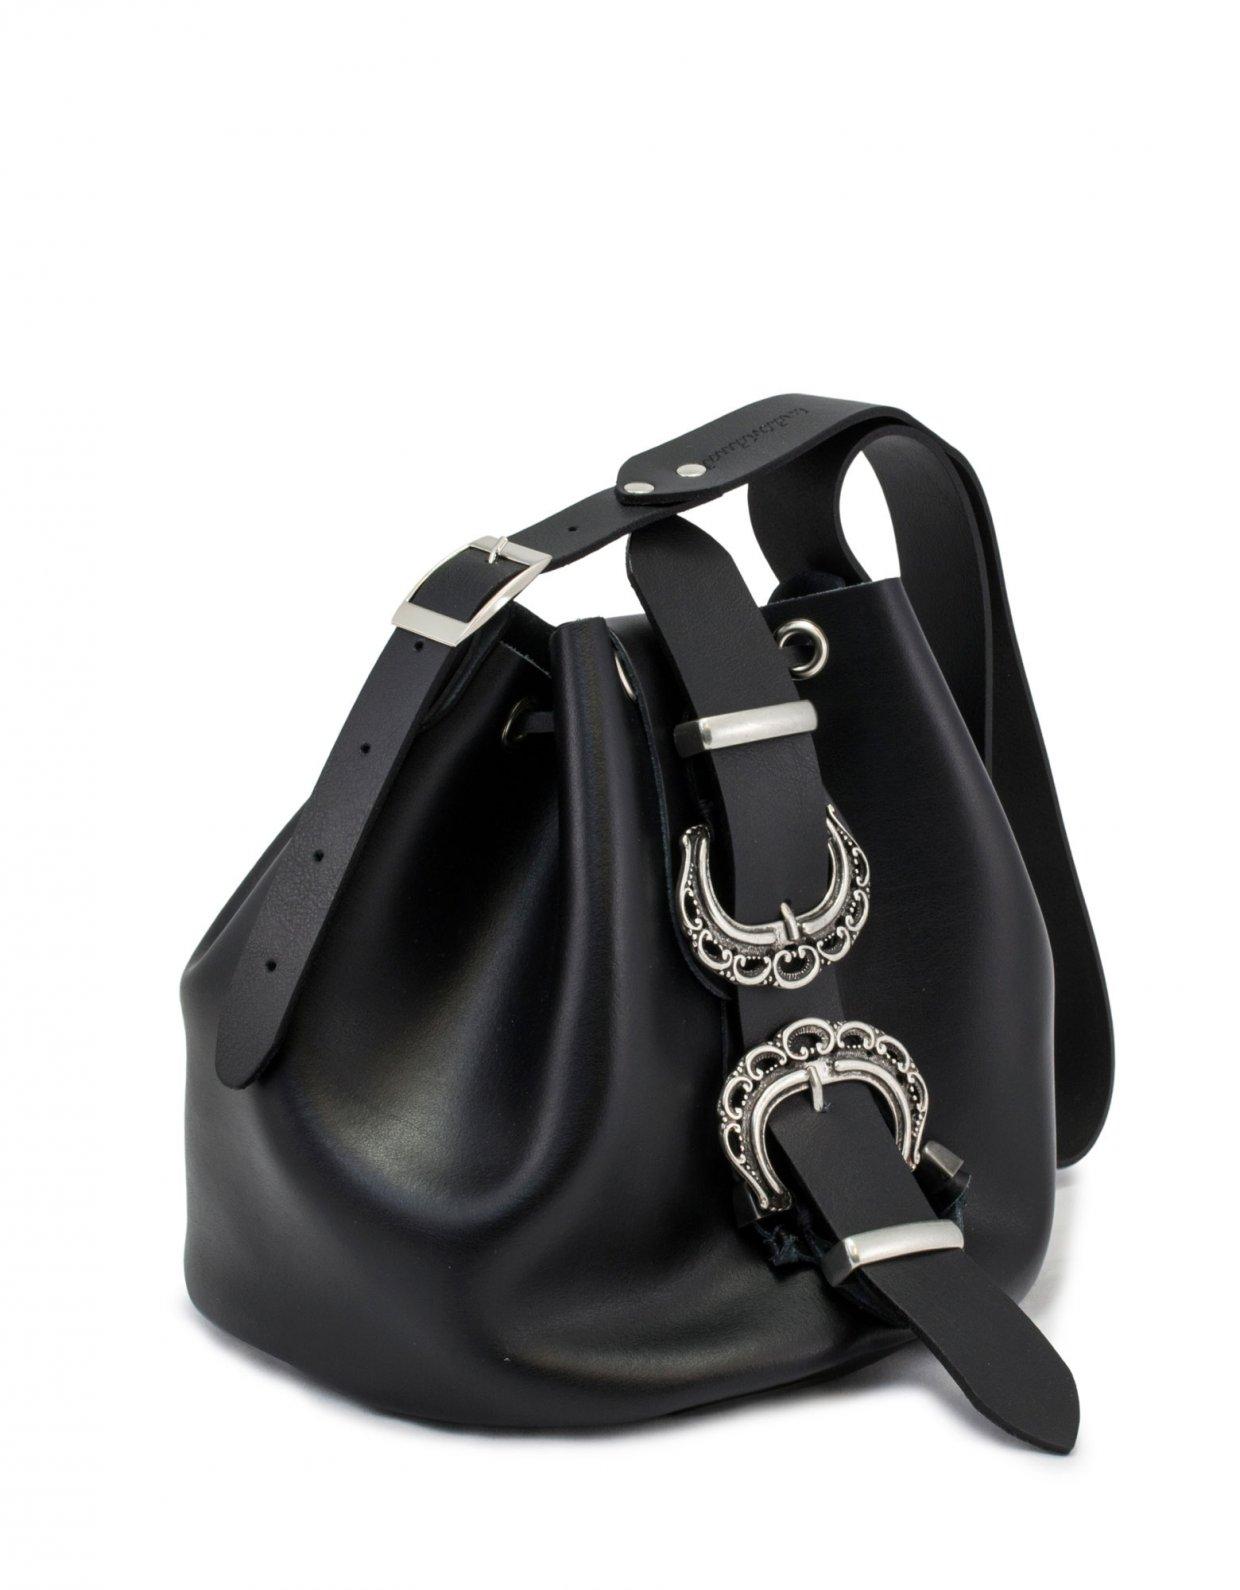 Individual Art Leather Everloving black bag